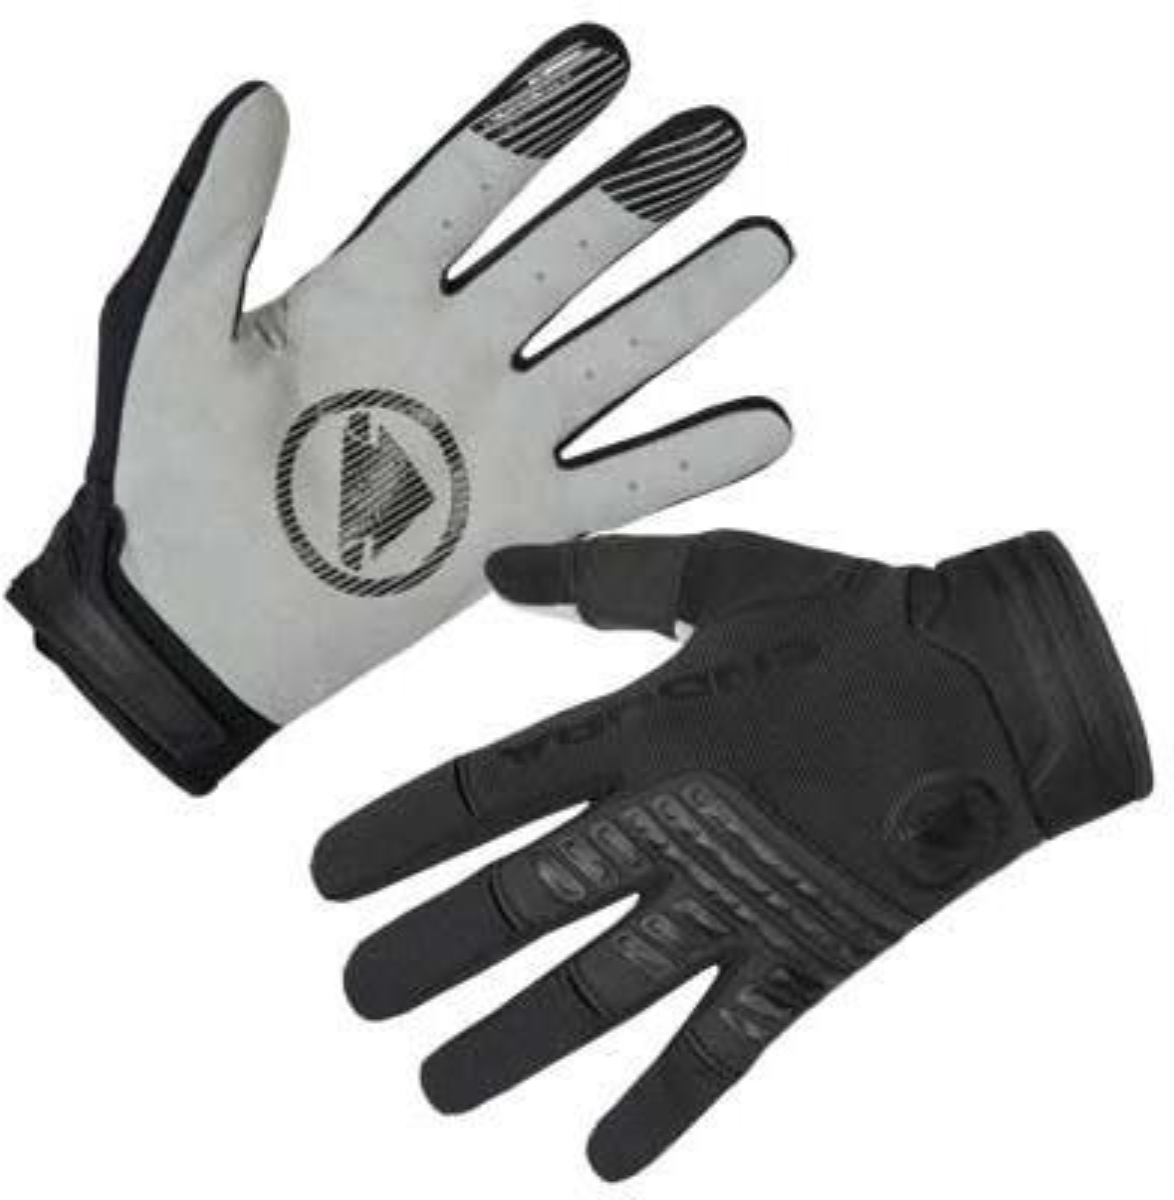 Handsker Endura Singletrack sort   Gloves